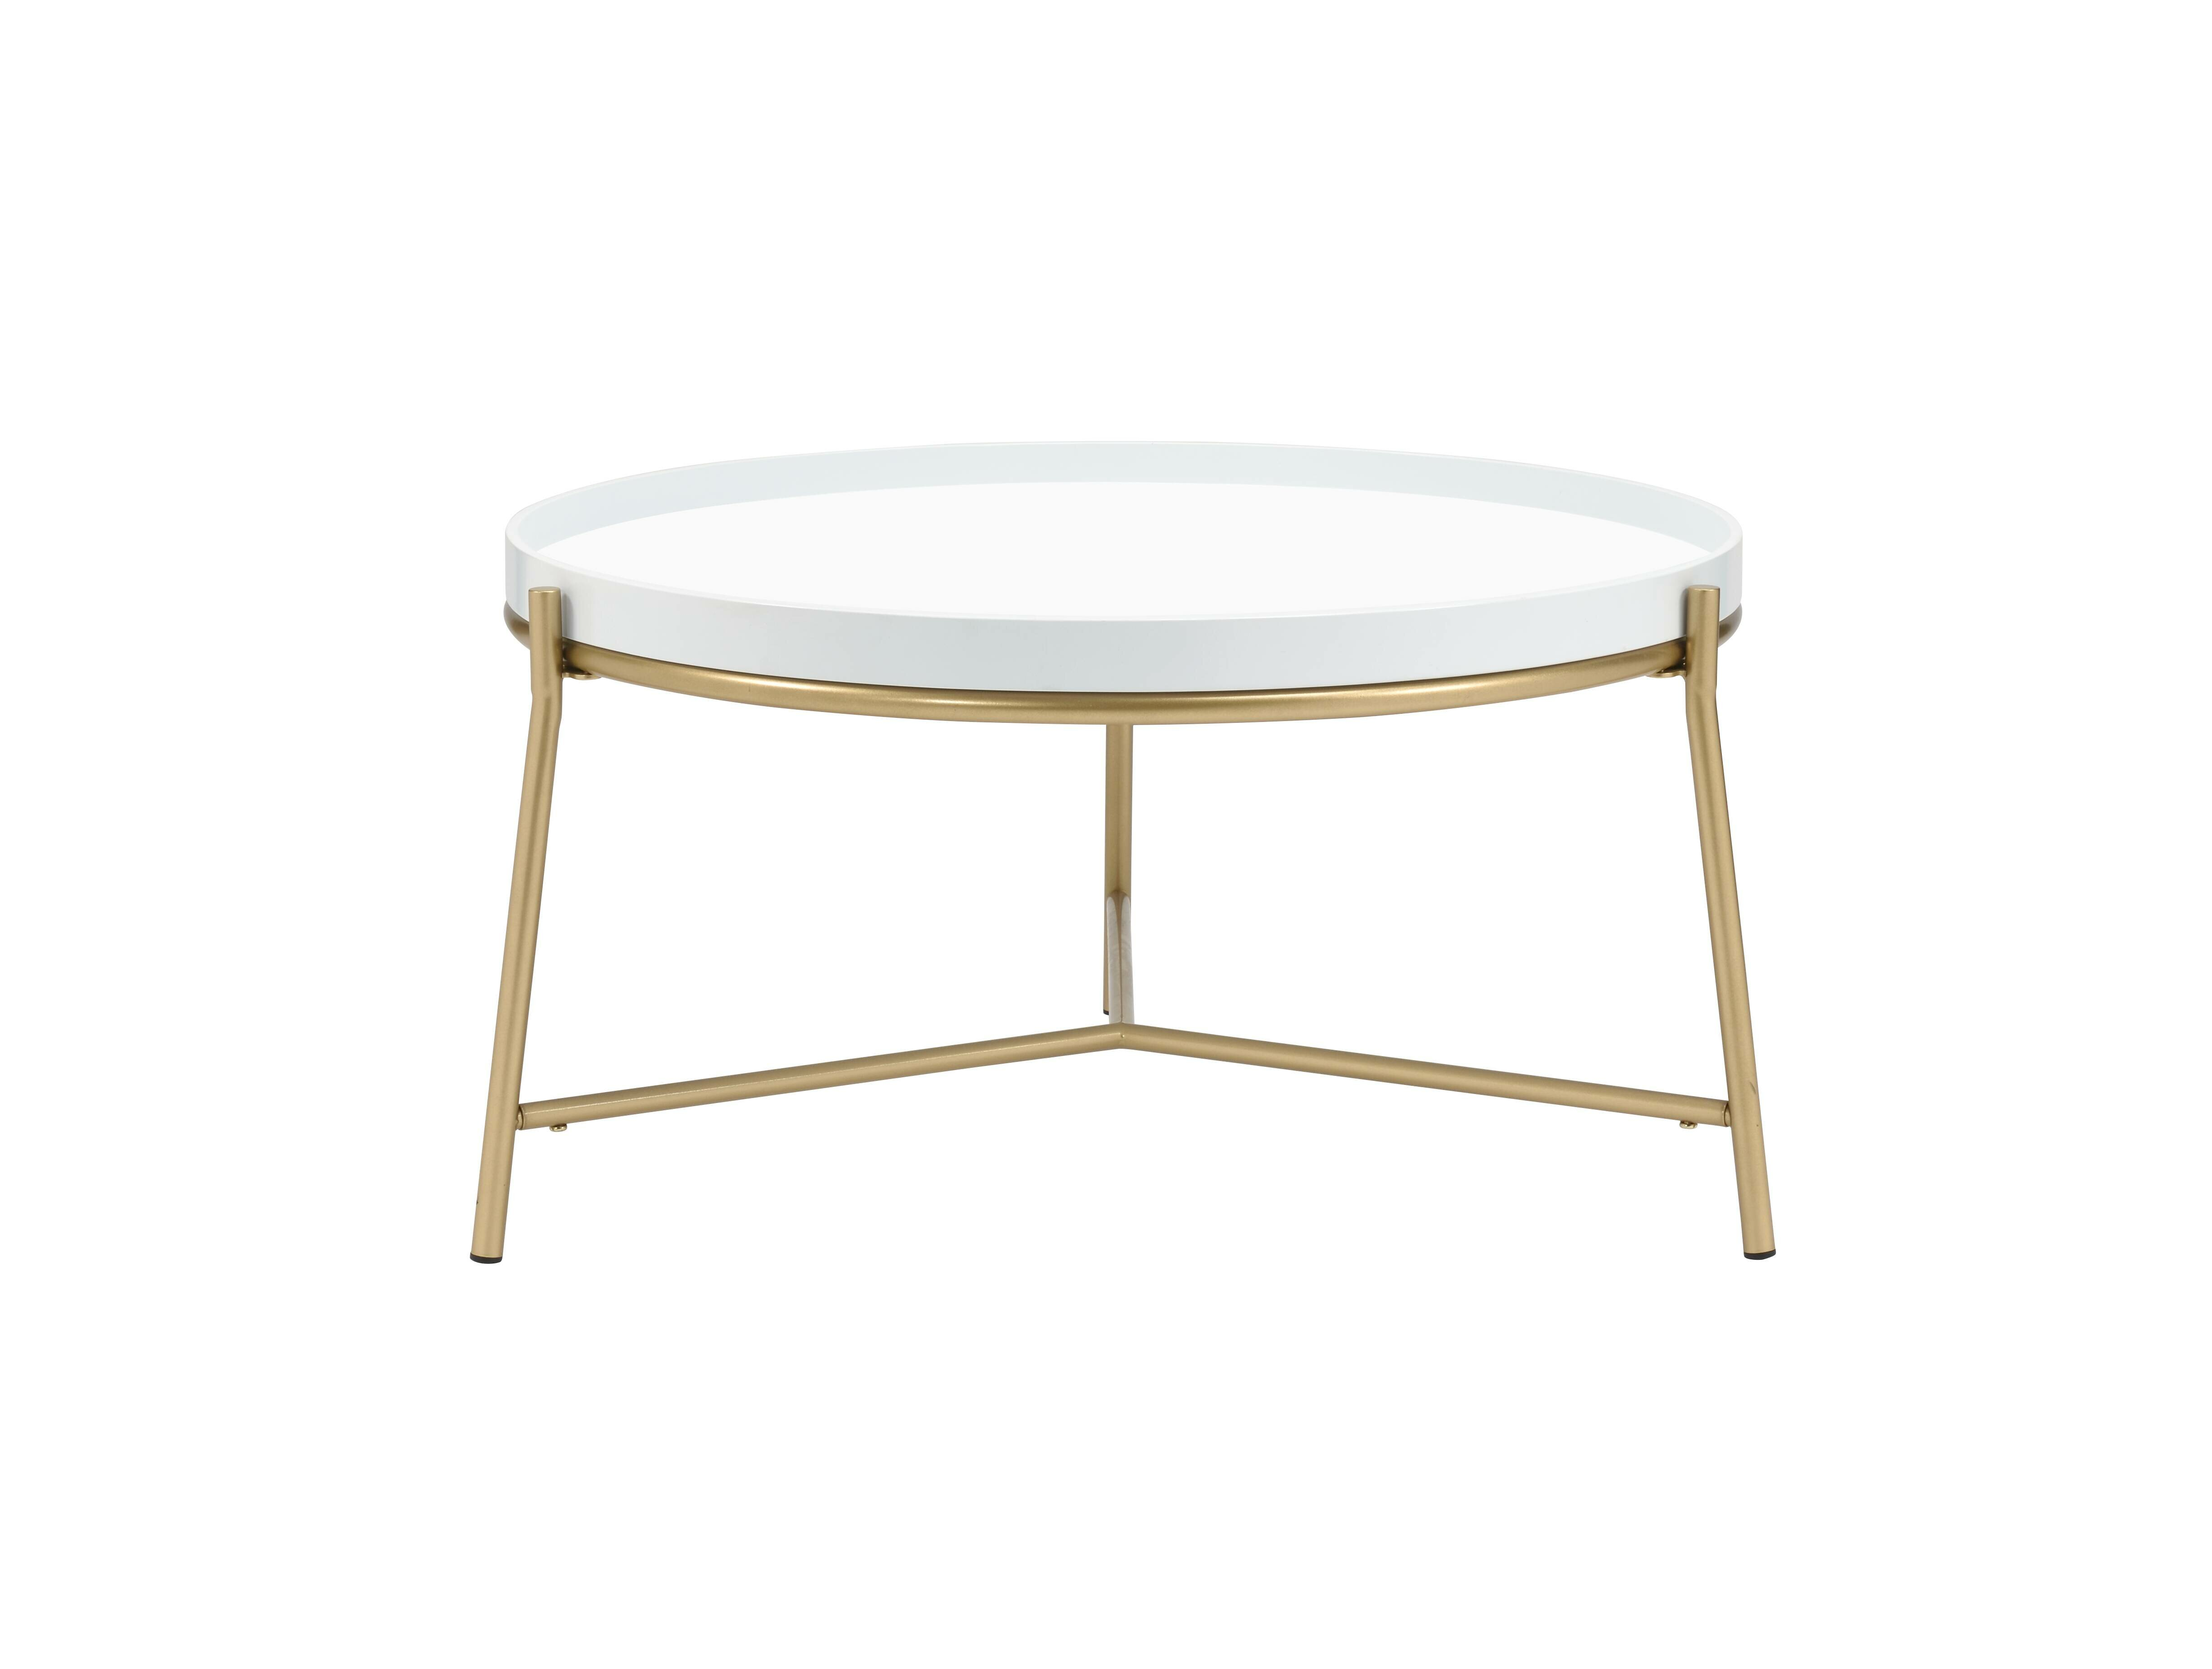 Mercer41 Spady 3 Legs Coffee Table Wayfair